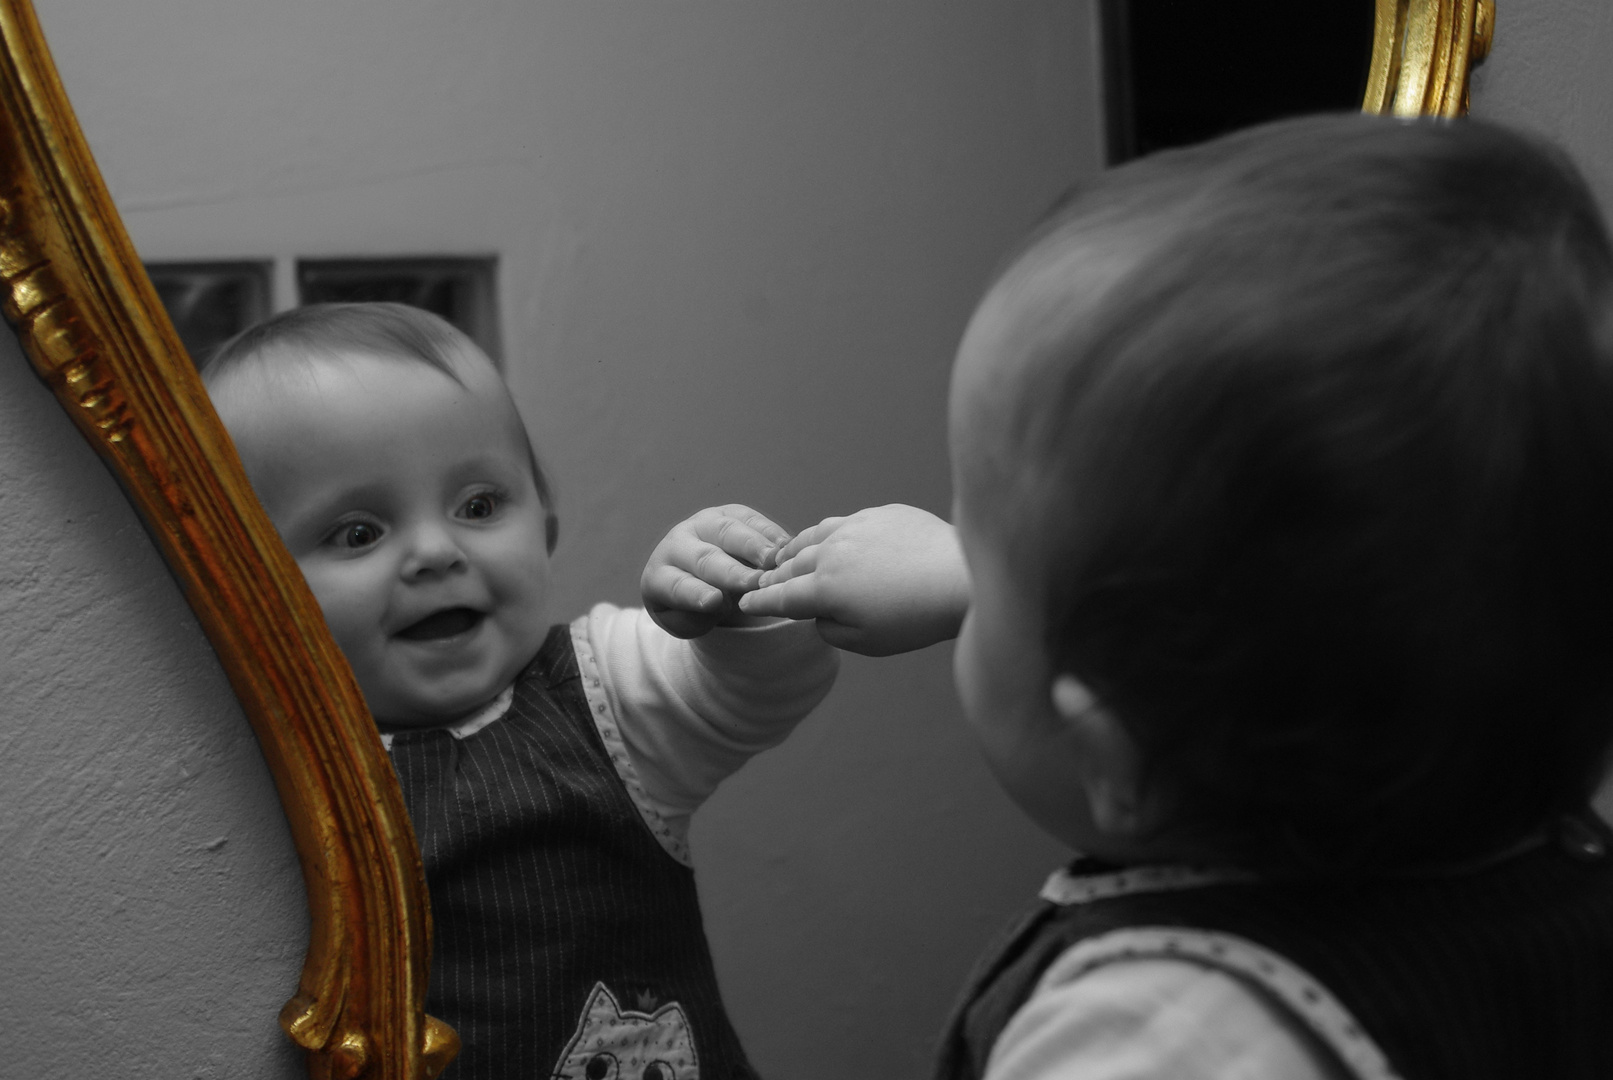 Miroir ... mon beau miroir ....